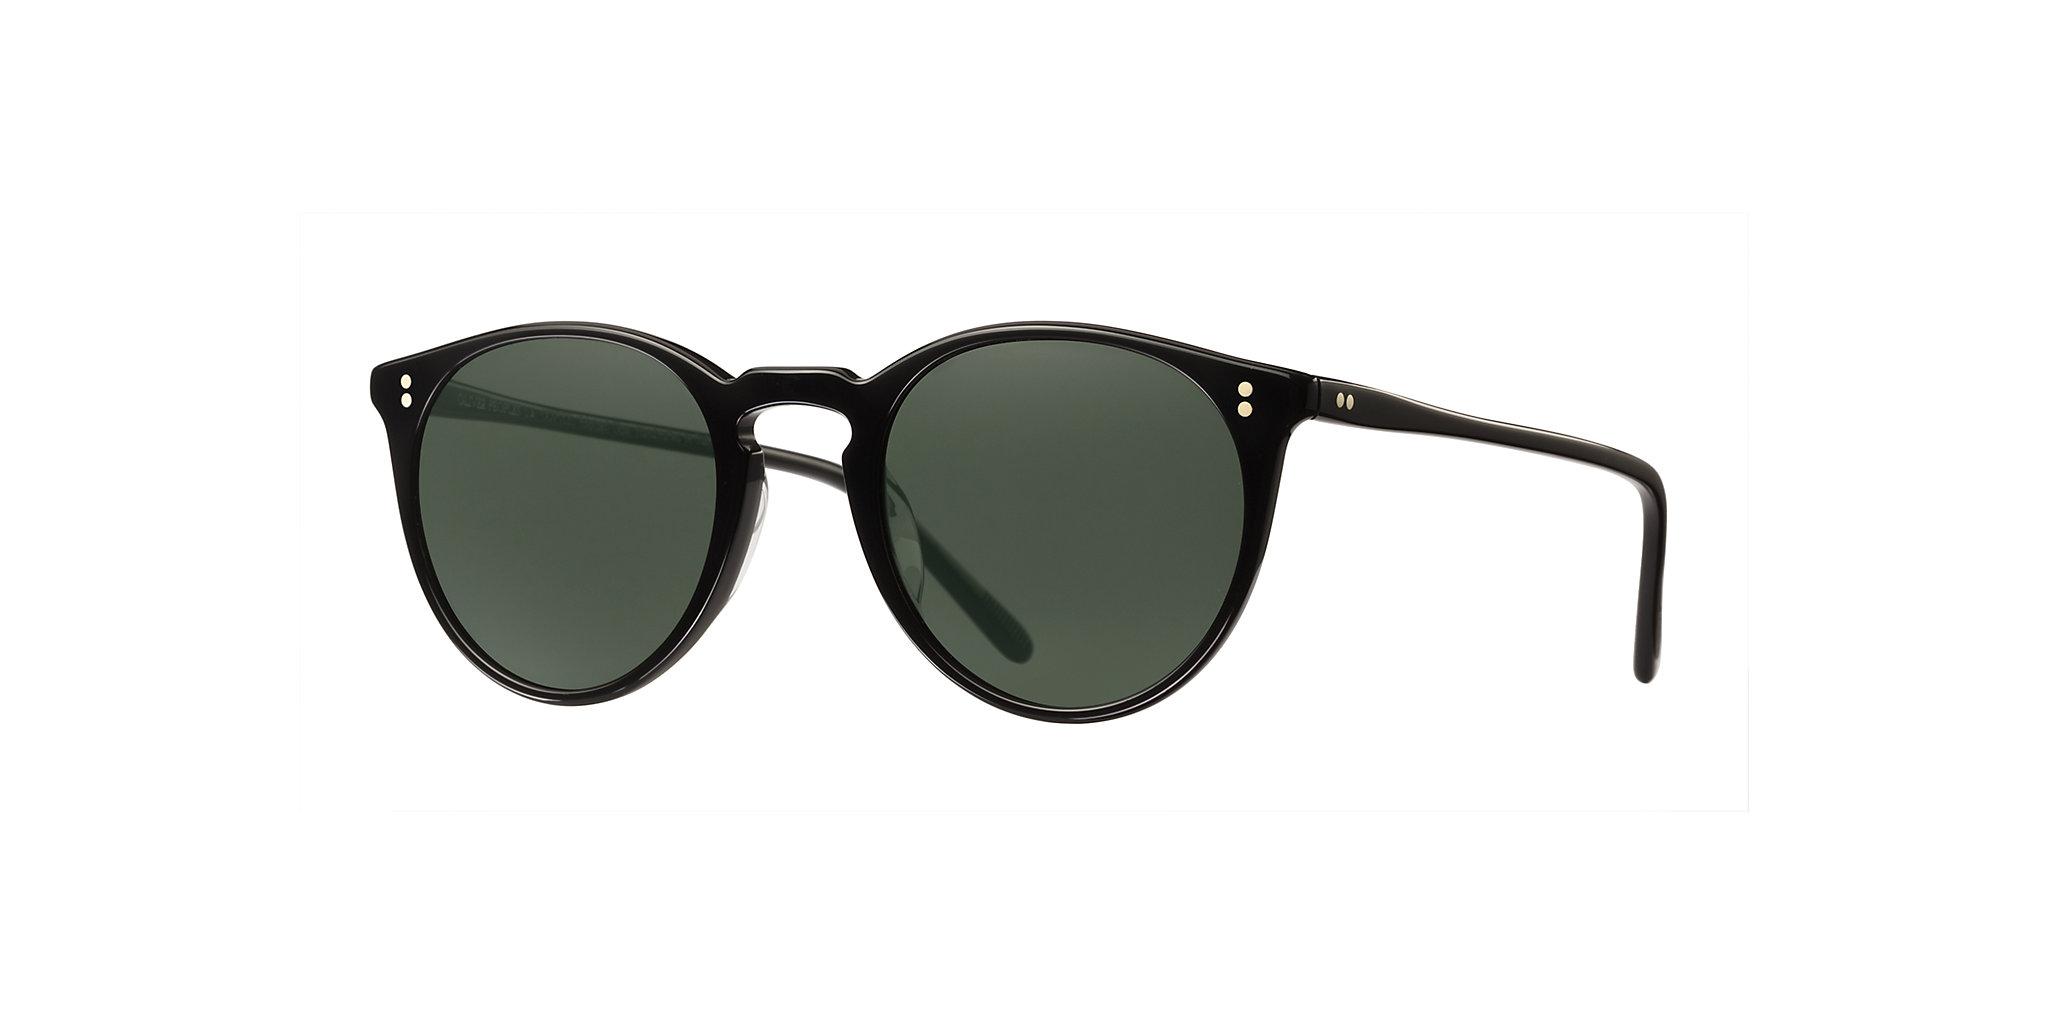 Black Peoples Oliver Black Black Sunglasses Sunglasses Sunglasses Peoples Peoples Oliver Oliver YIb6vyf7g